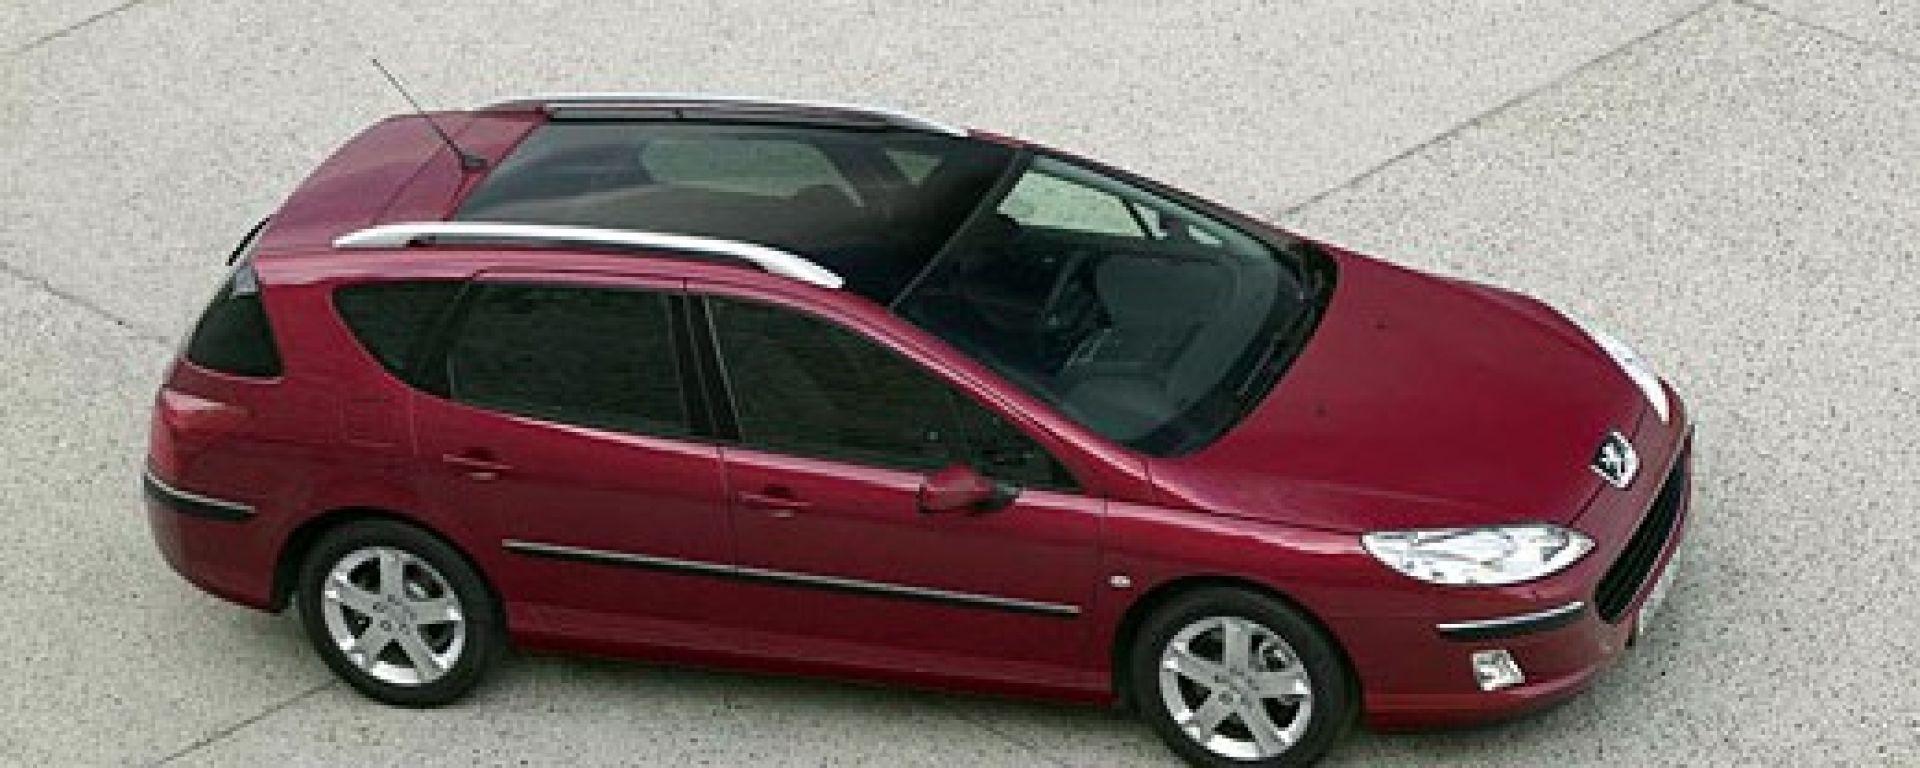 Peugeot 407 SW HDi